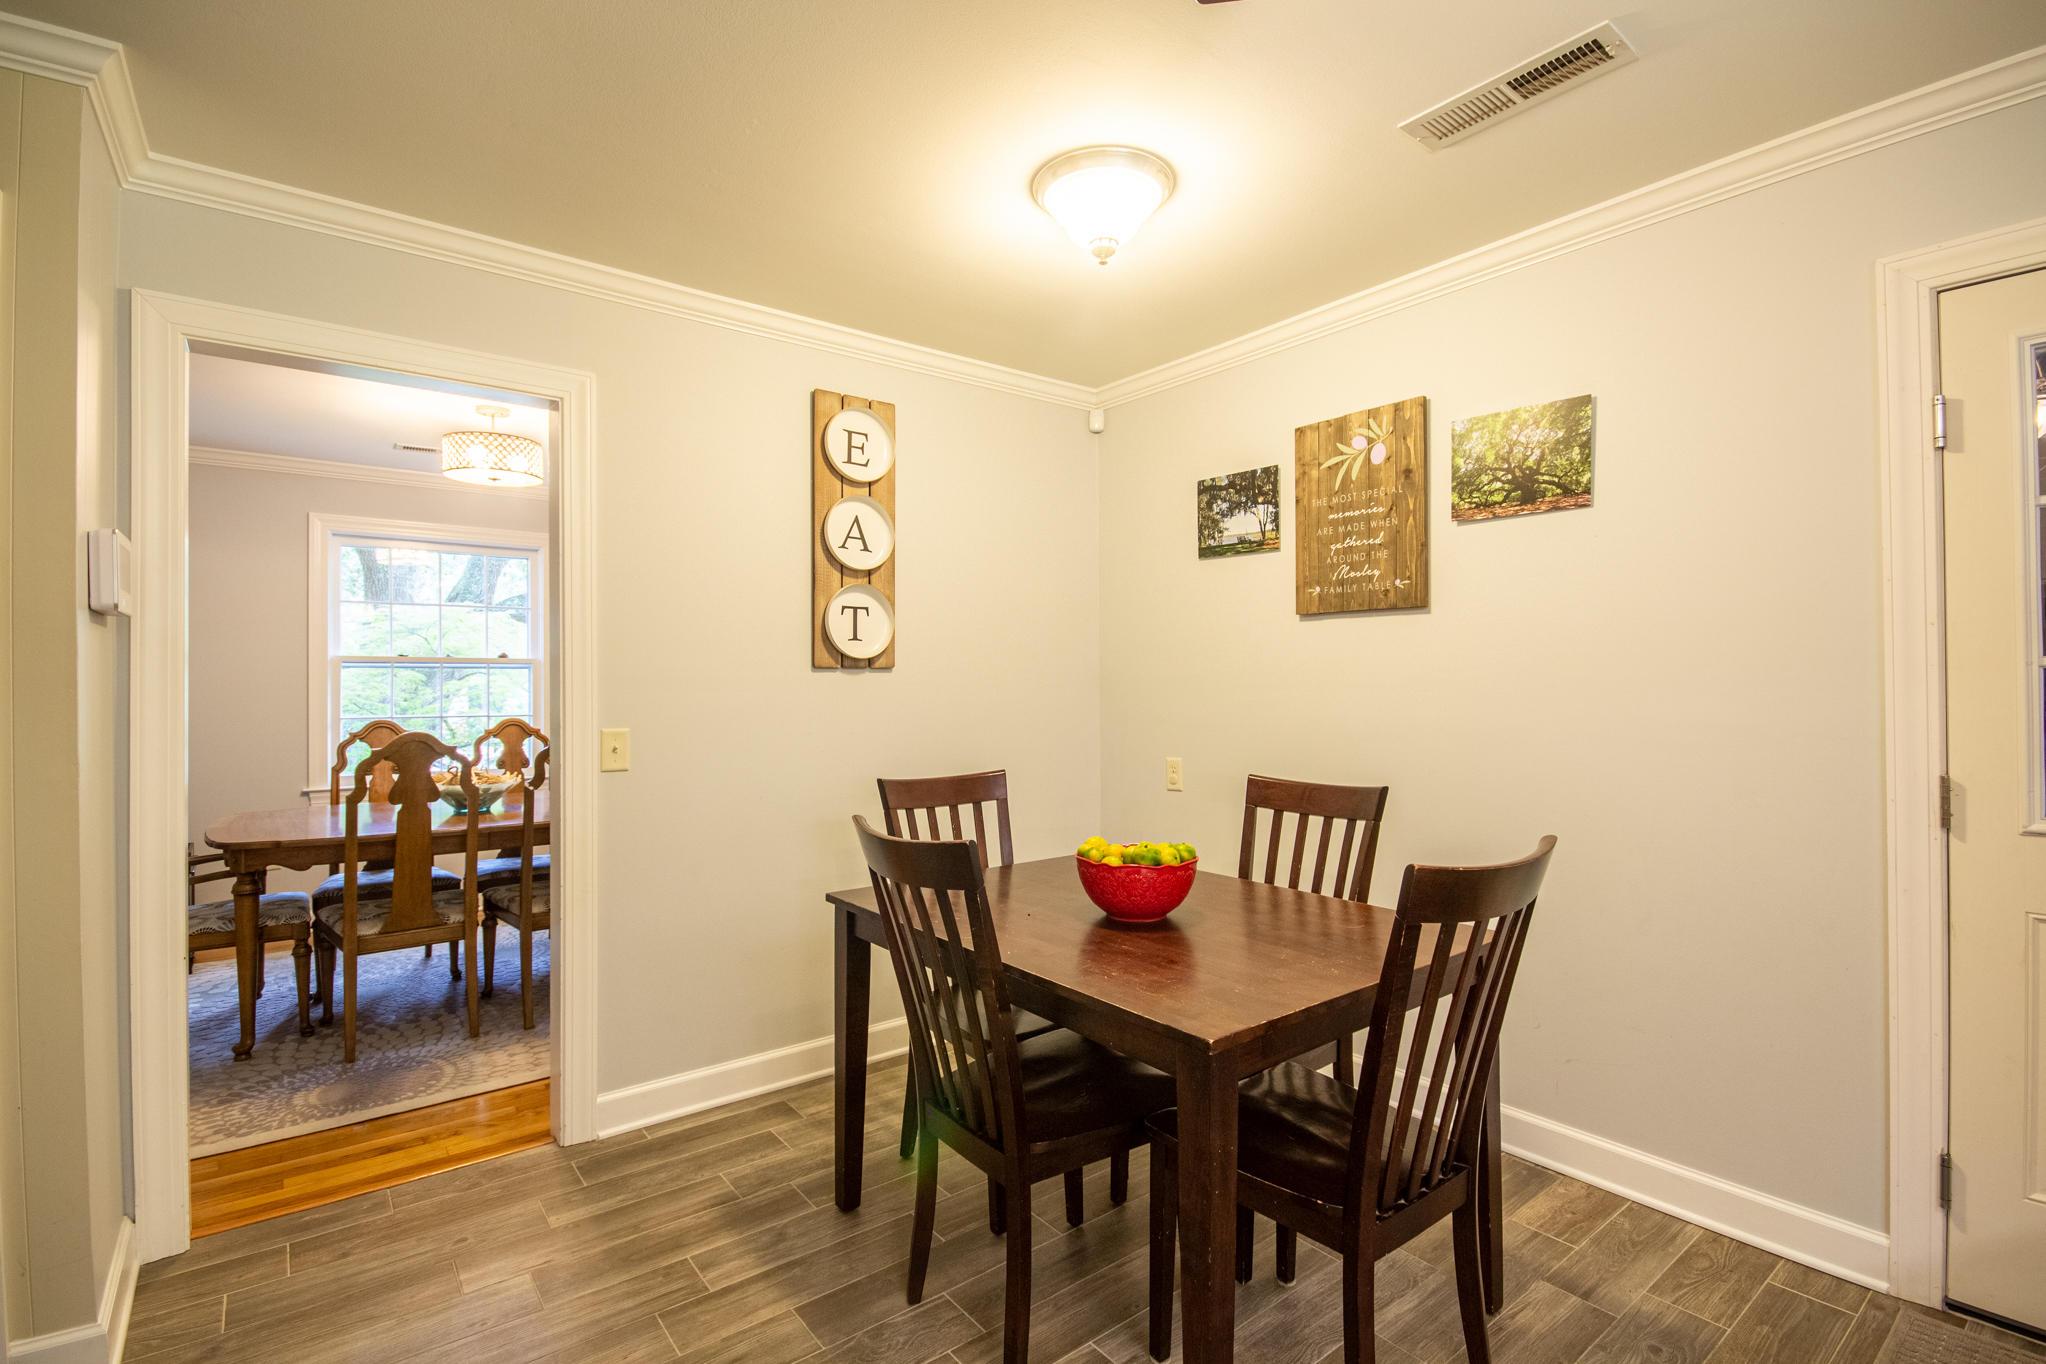 Belvedere Estates Homes For Sale - 6021 Rembert, Hanahan, SC - 0